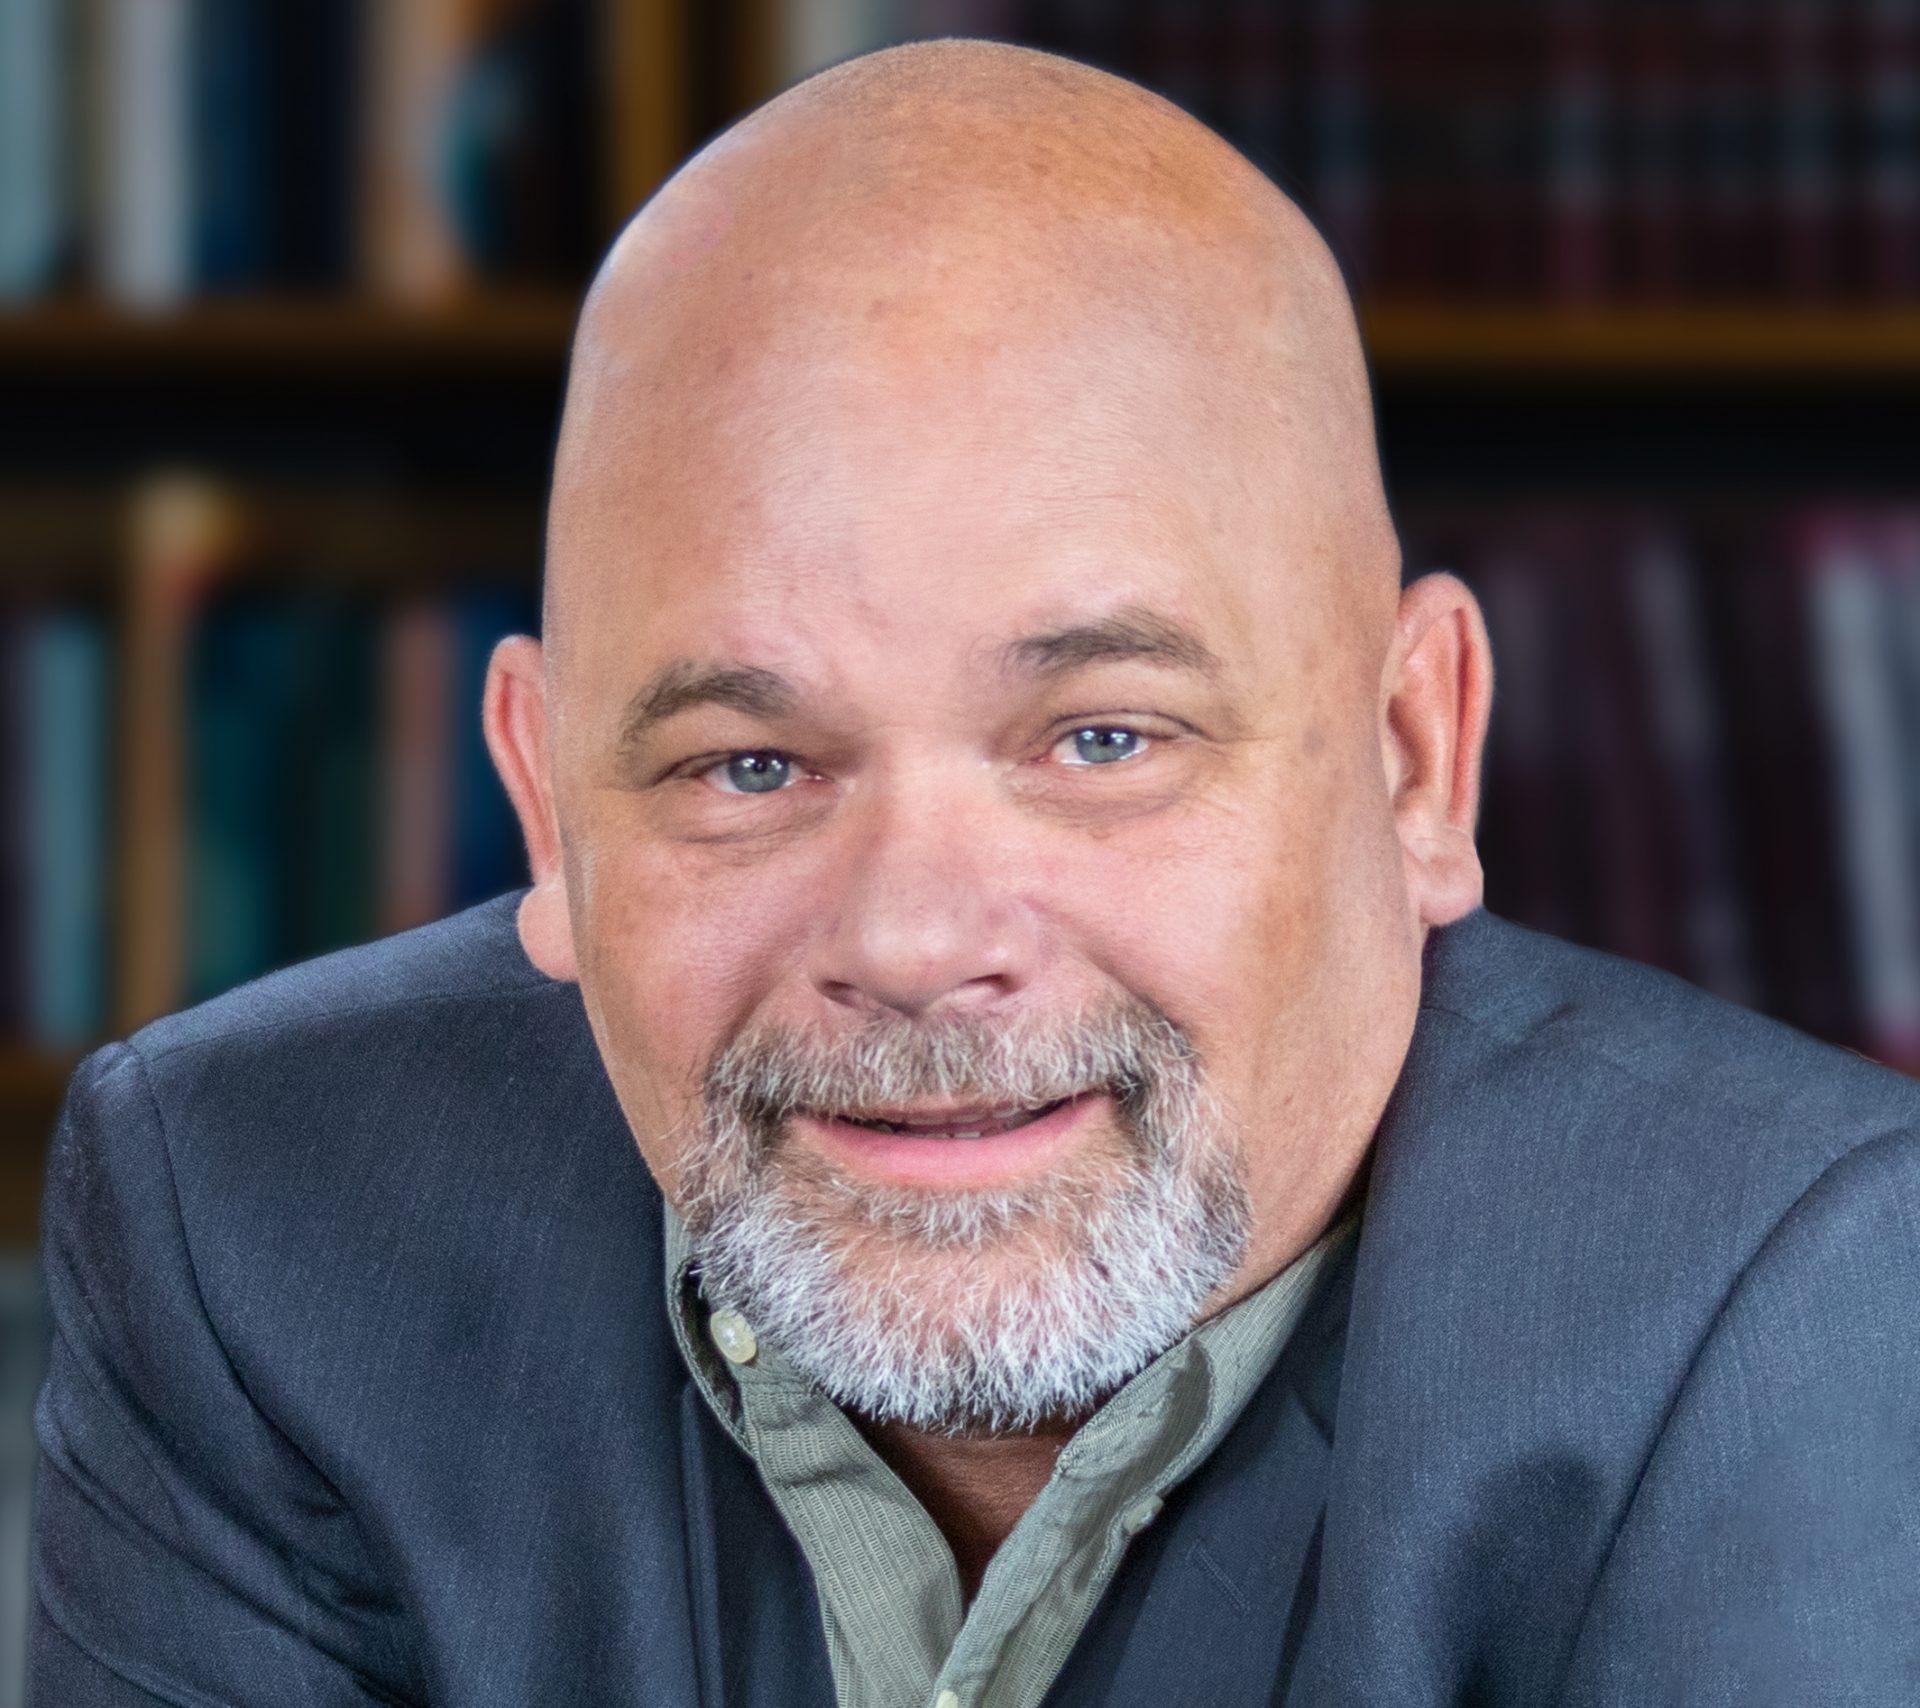 Dr. Rick Chromey